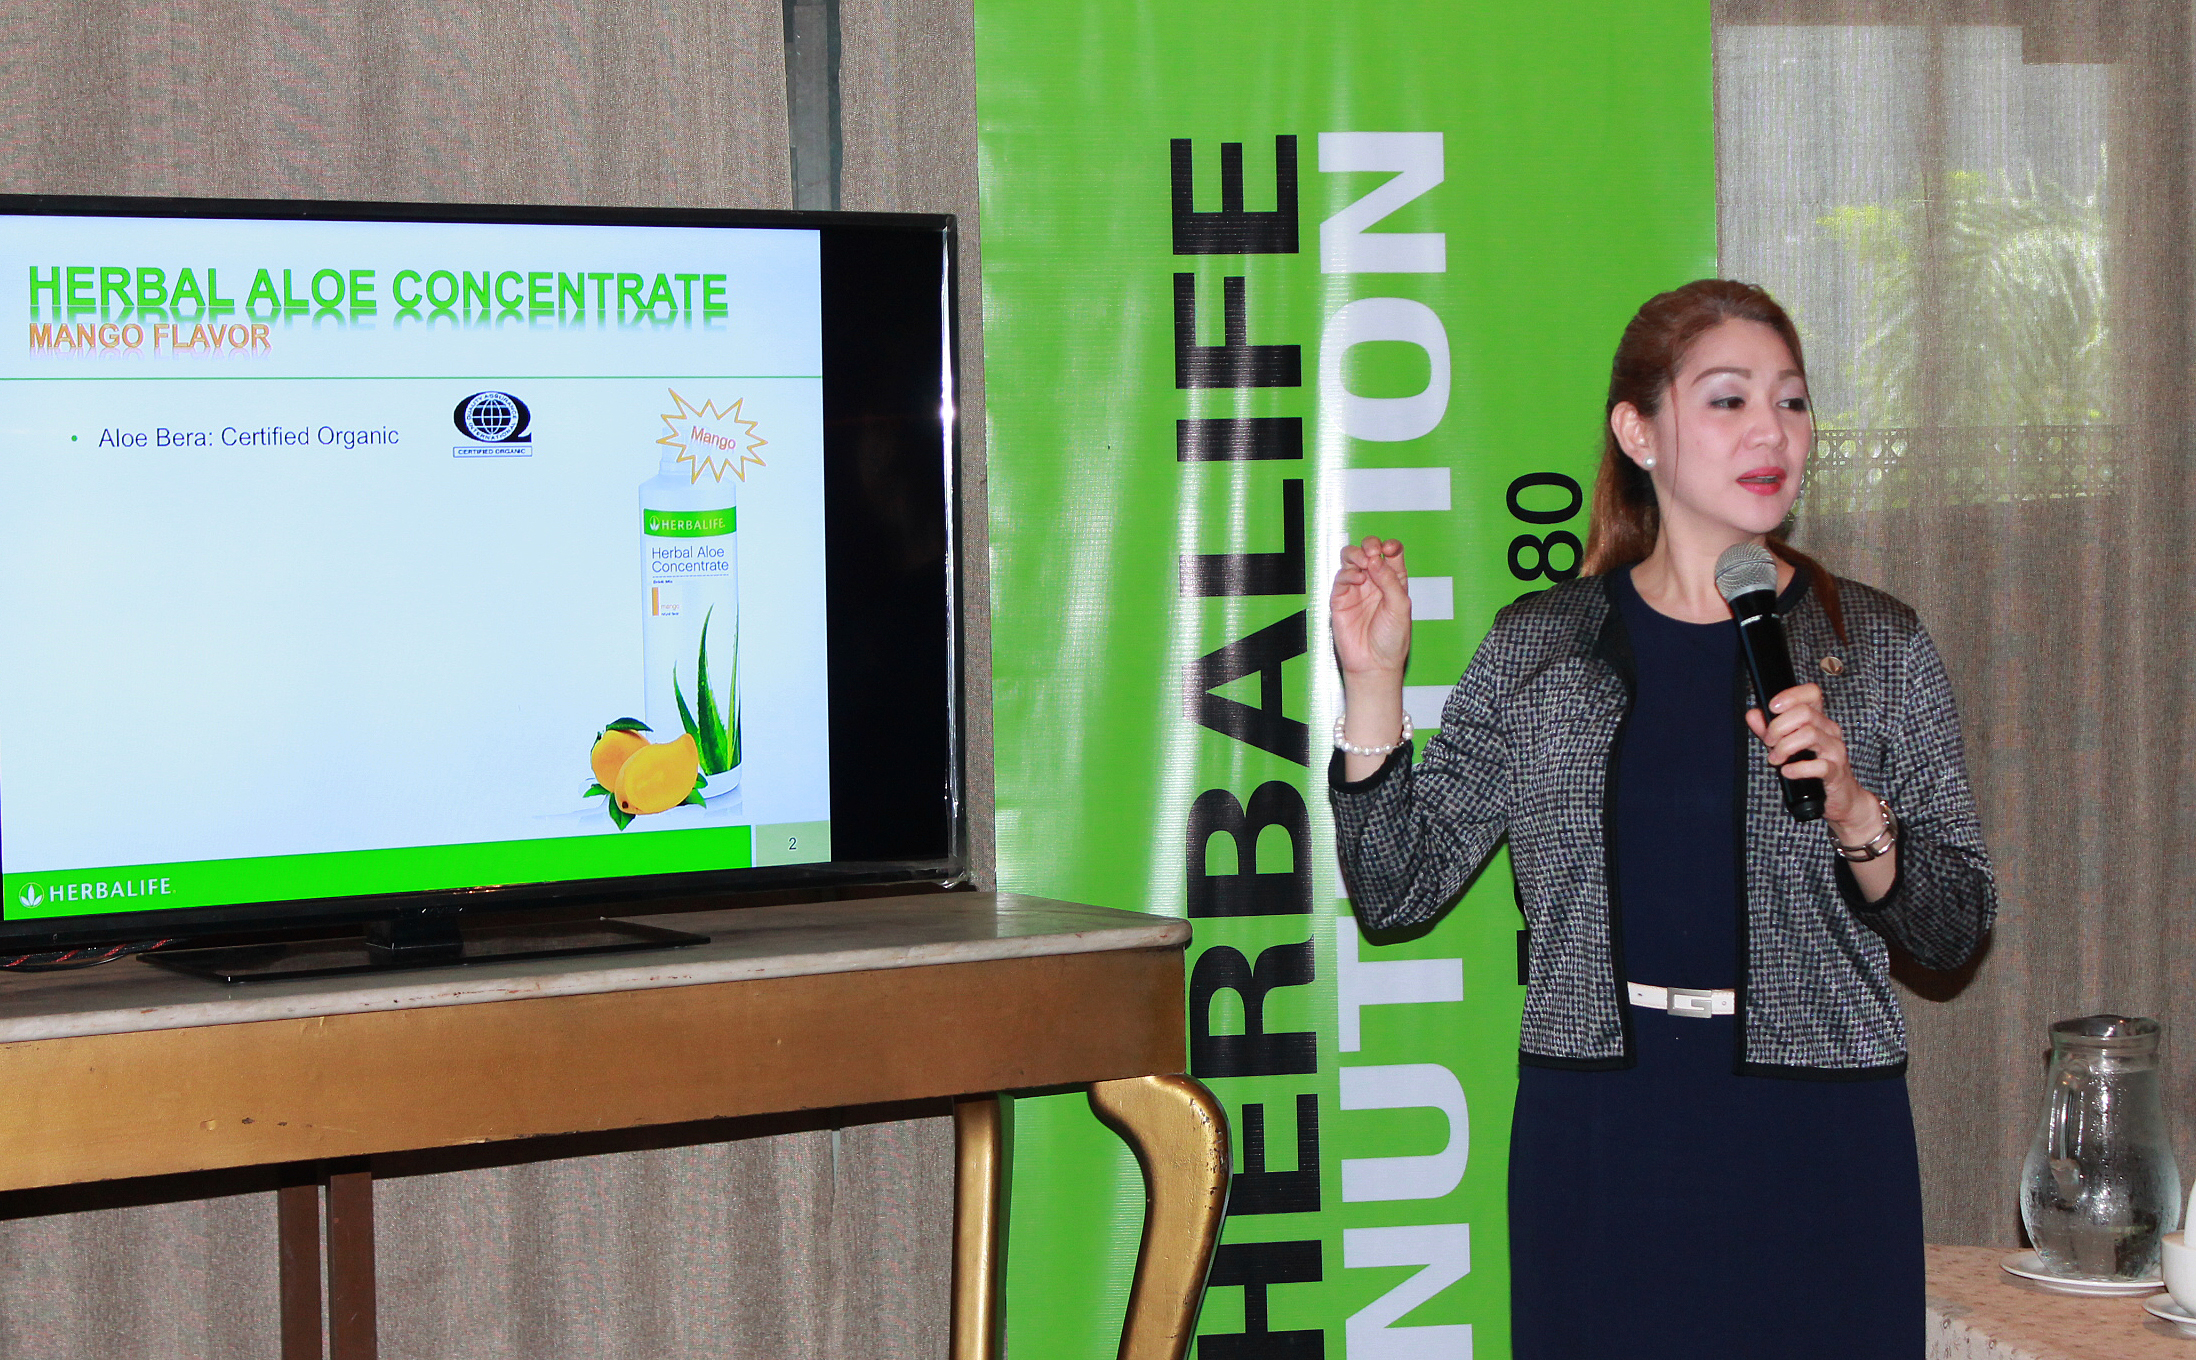 Marie-Seguismundo, Herbalife-Marketing-Manager